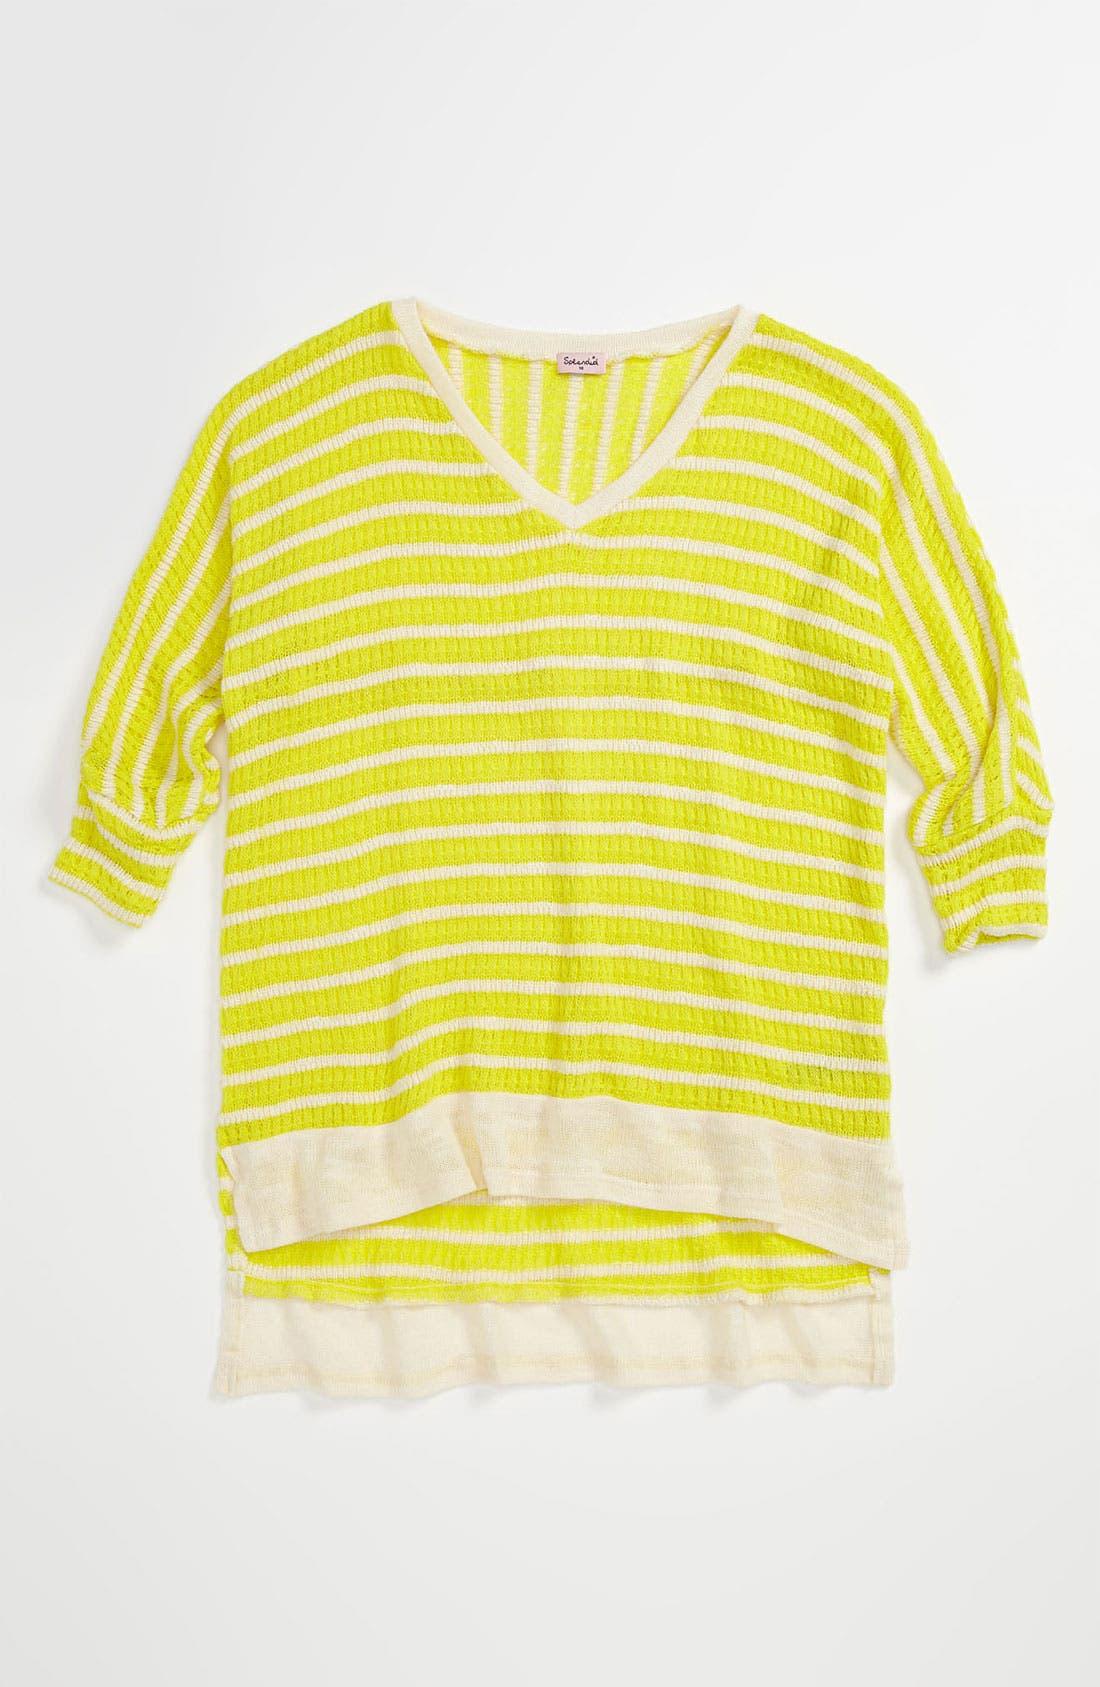 Main Image - Splendid 'Panama' Stripe Top (Big Girls)